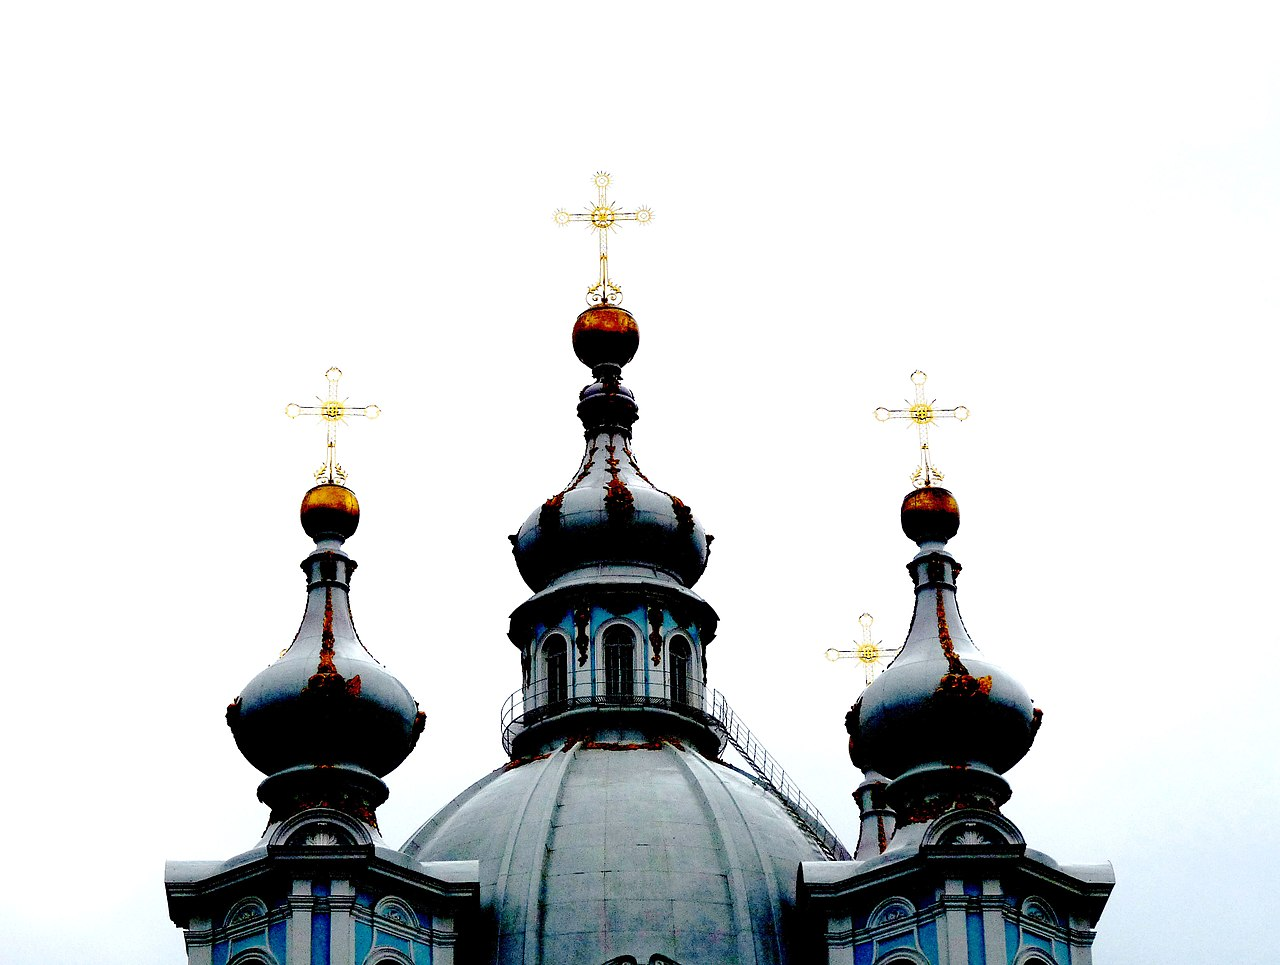 Смольный собор. Звонница. Фото: michael clarke stuff (Wikimedia Commons)